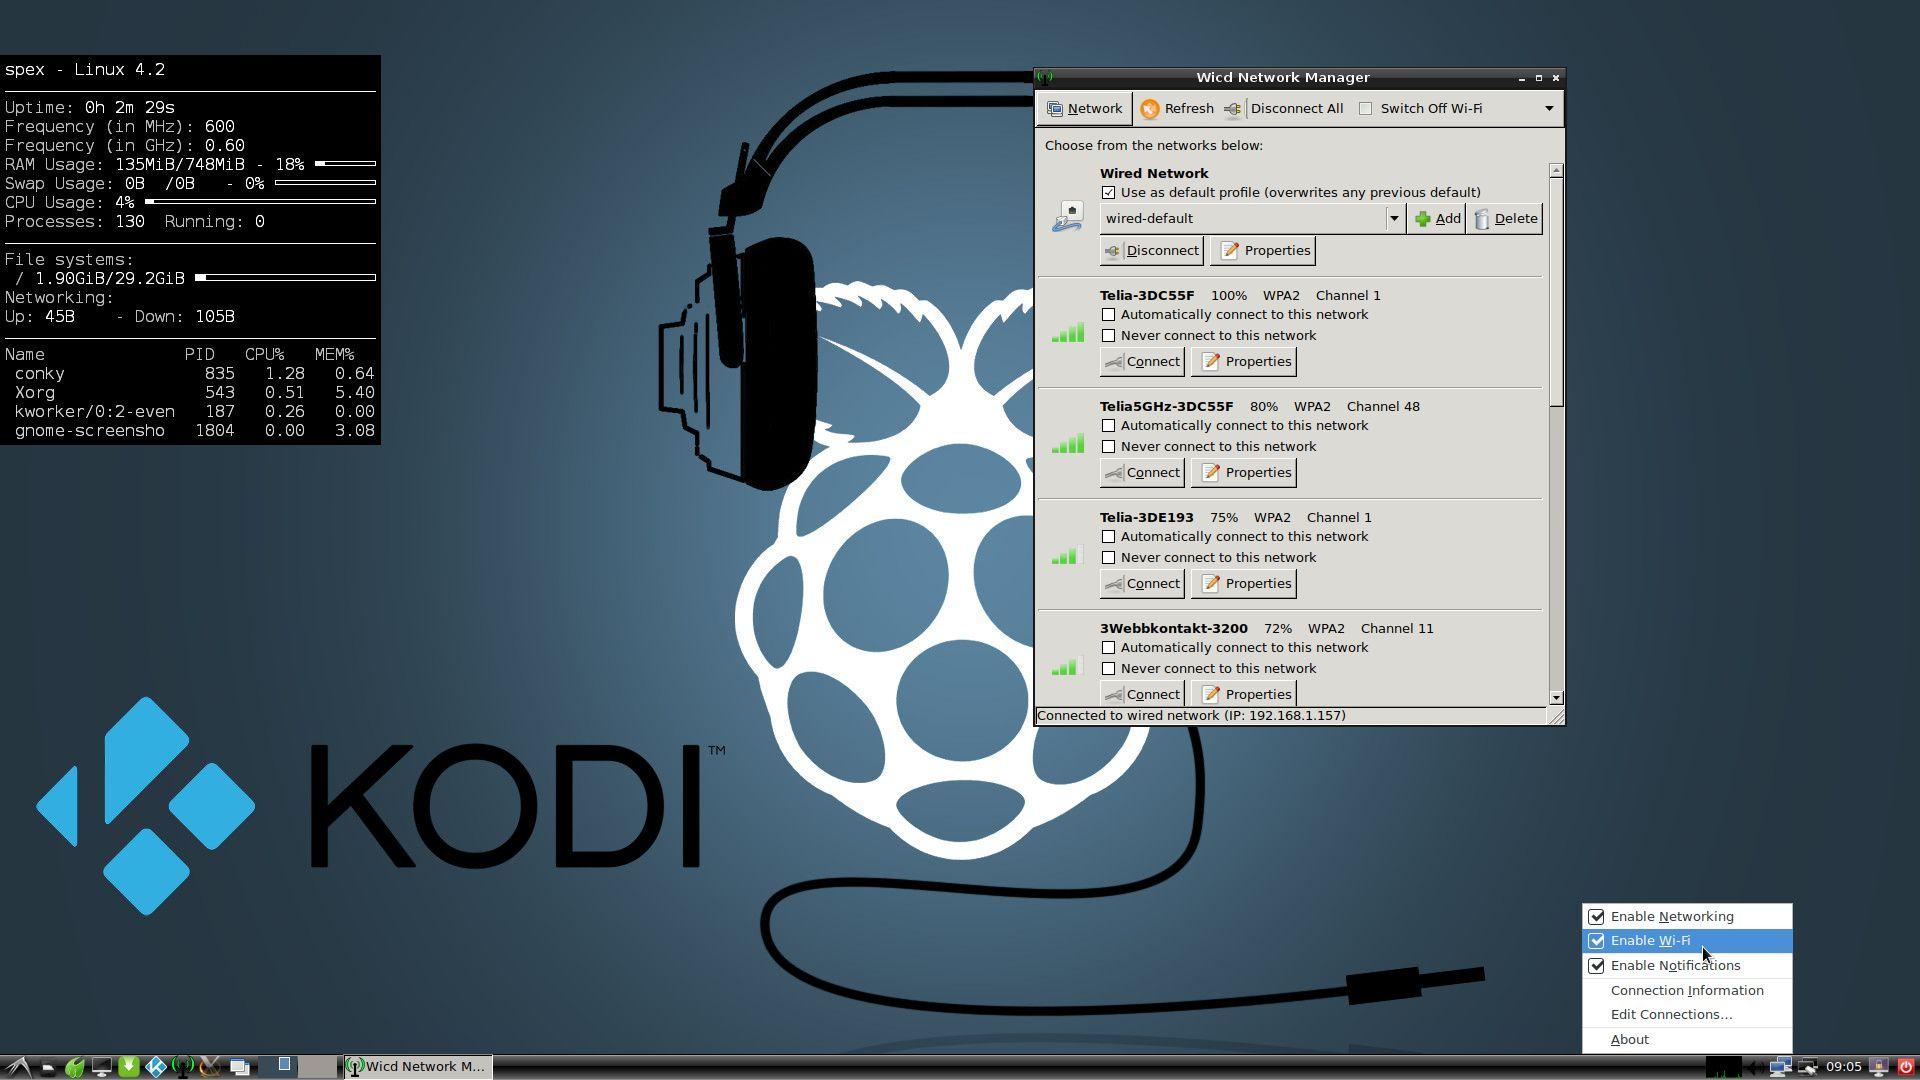 RaspEX Kodi Rpi3 with LXDE/OSMC Desktops and Kodi 18 RC5